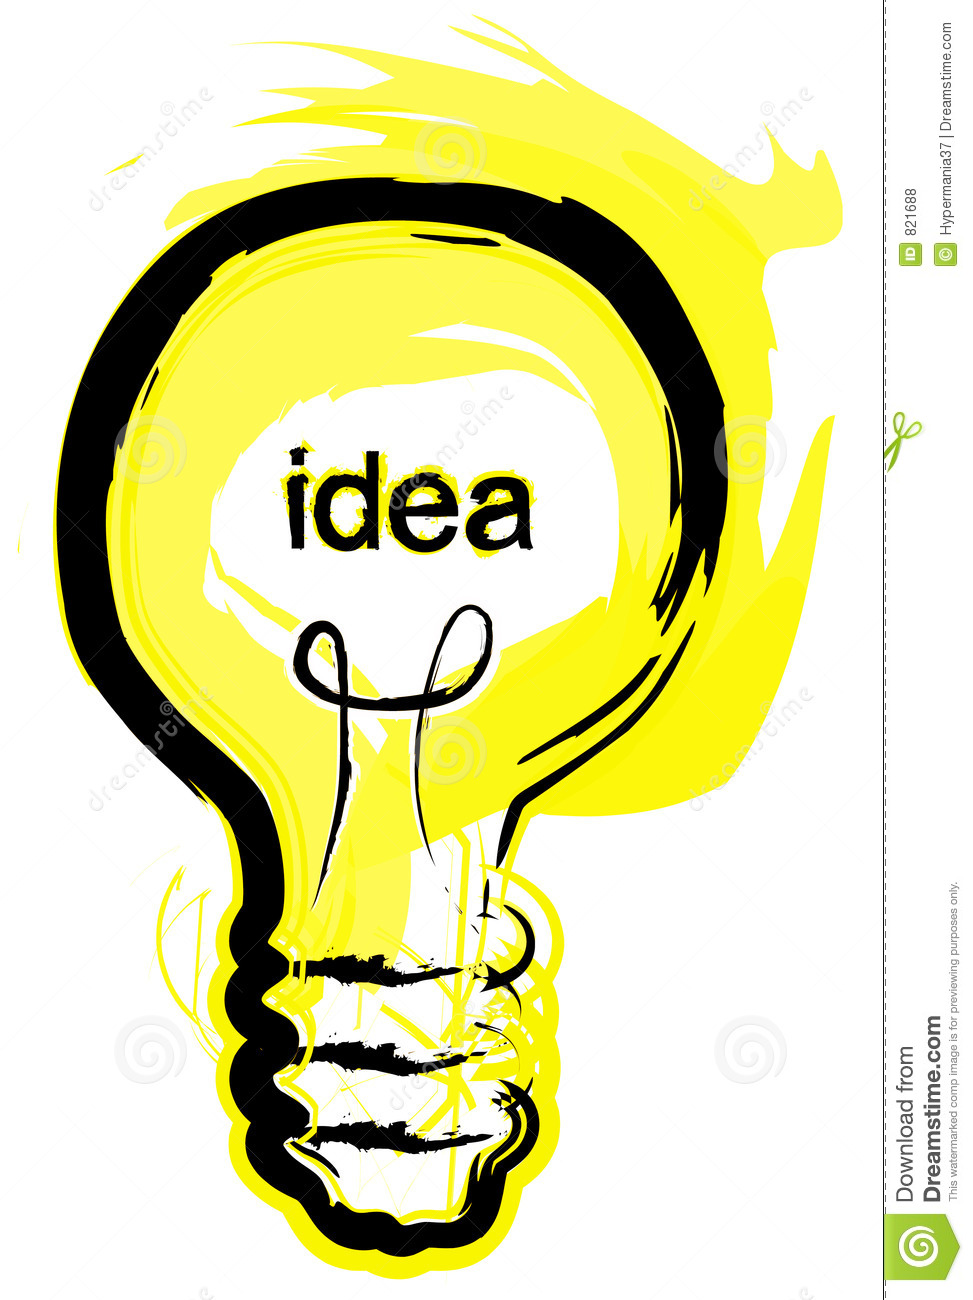 Main idea clipart svg stock Idea clipart - ClipartFest svg stock